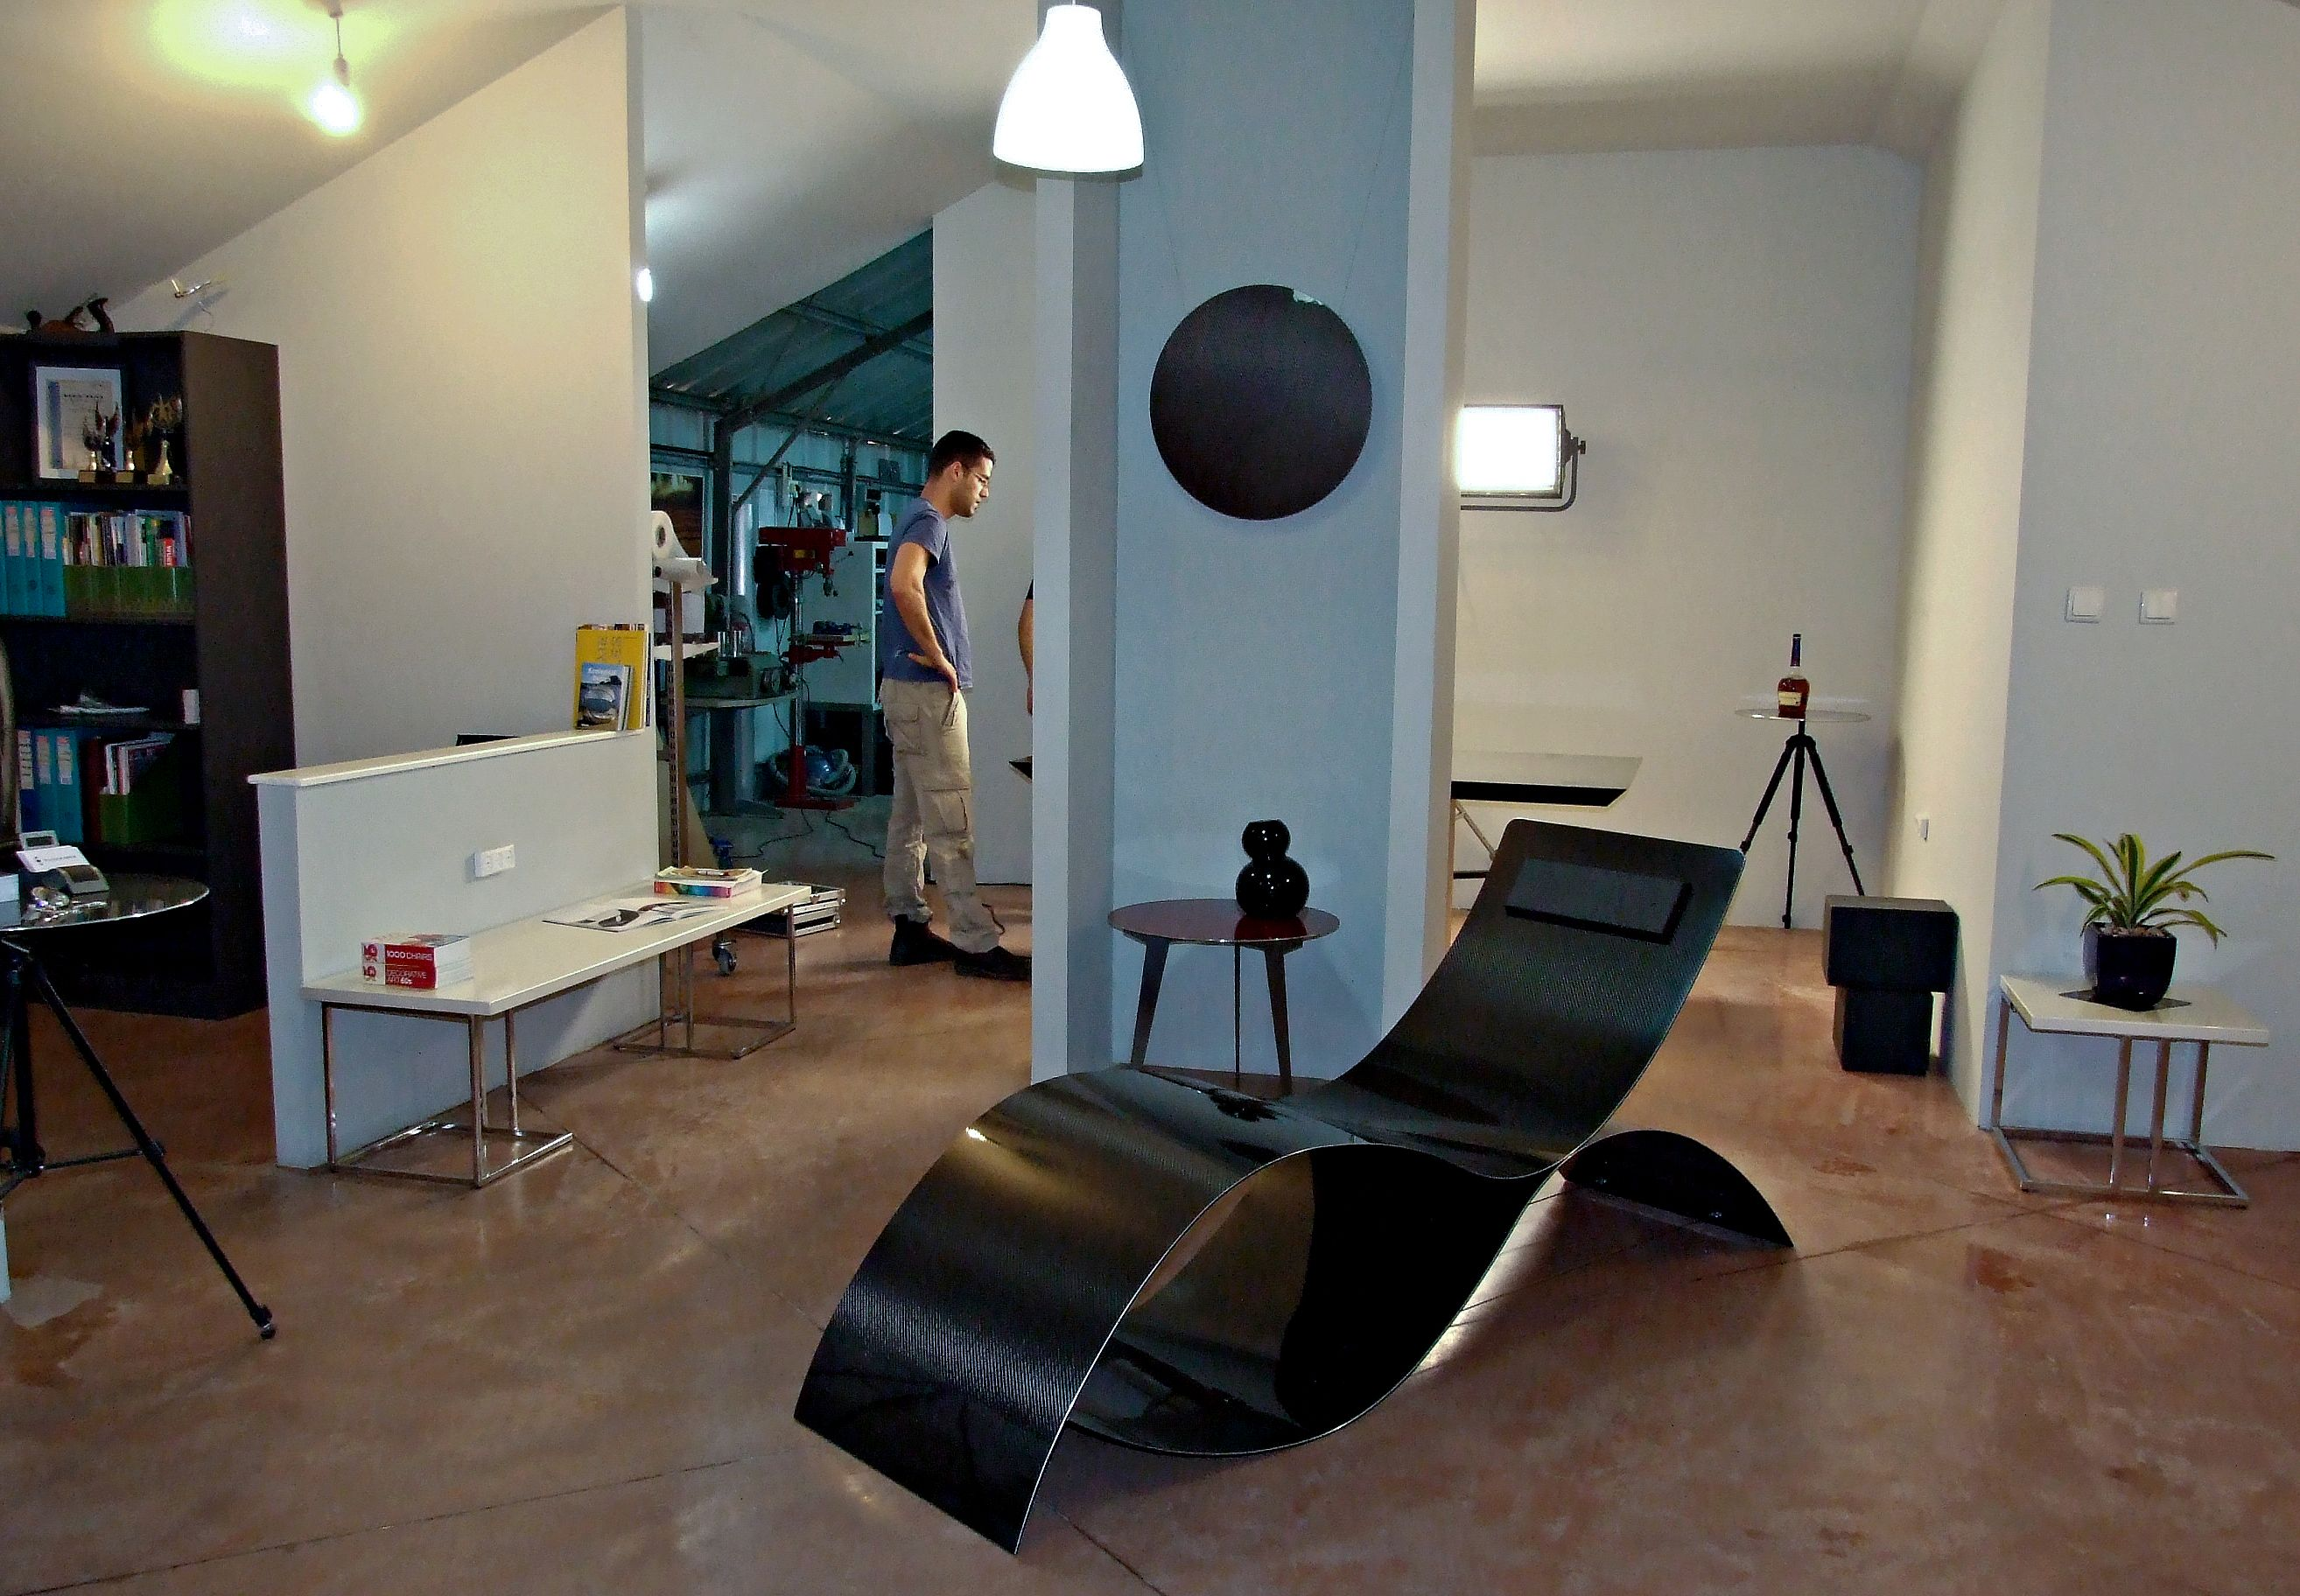 WALK TALK studio visit Nano Fiber. We loved the carbon Chezlong, designed by Asa Levental